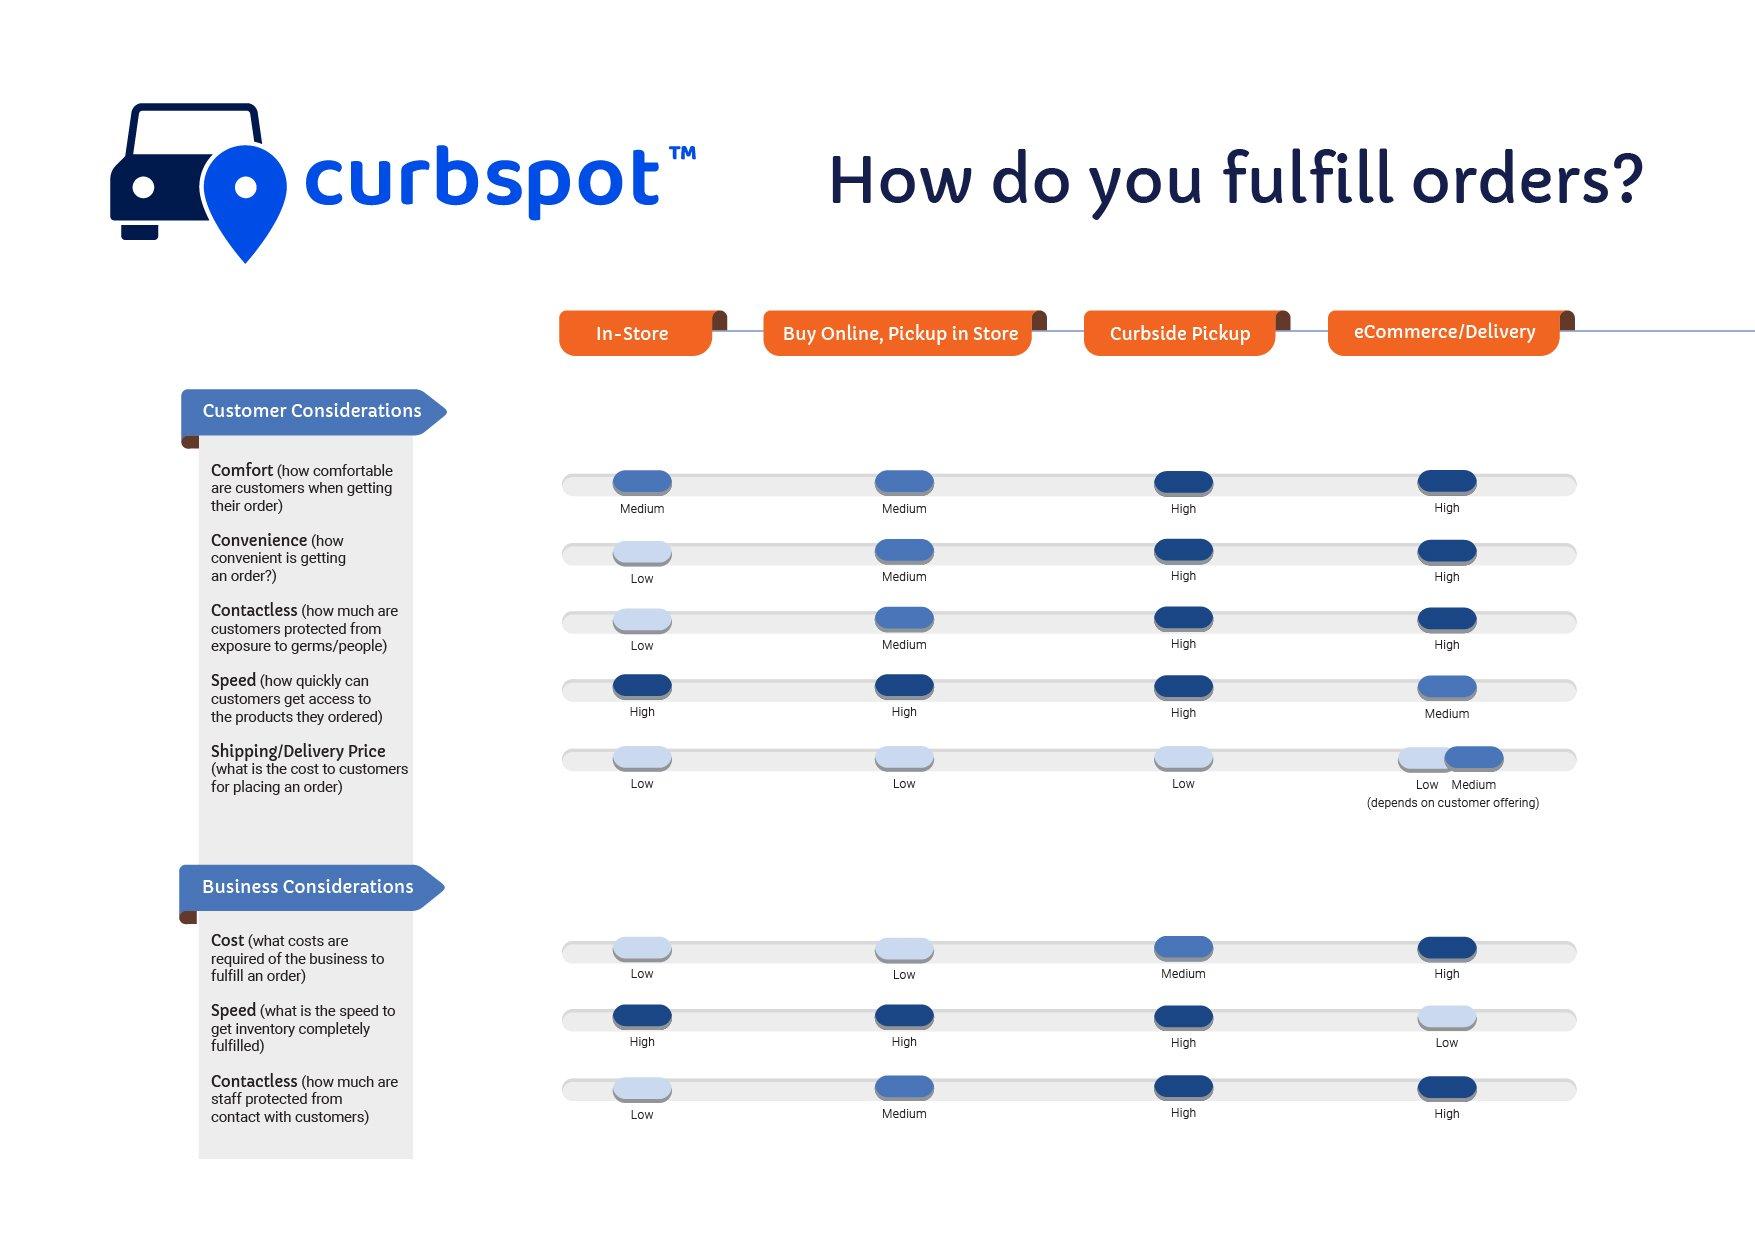 Curbspot Fulfillment Chart